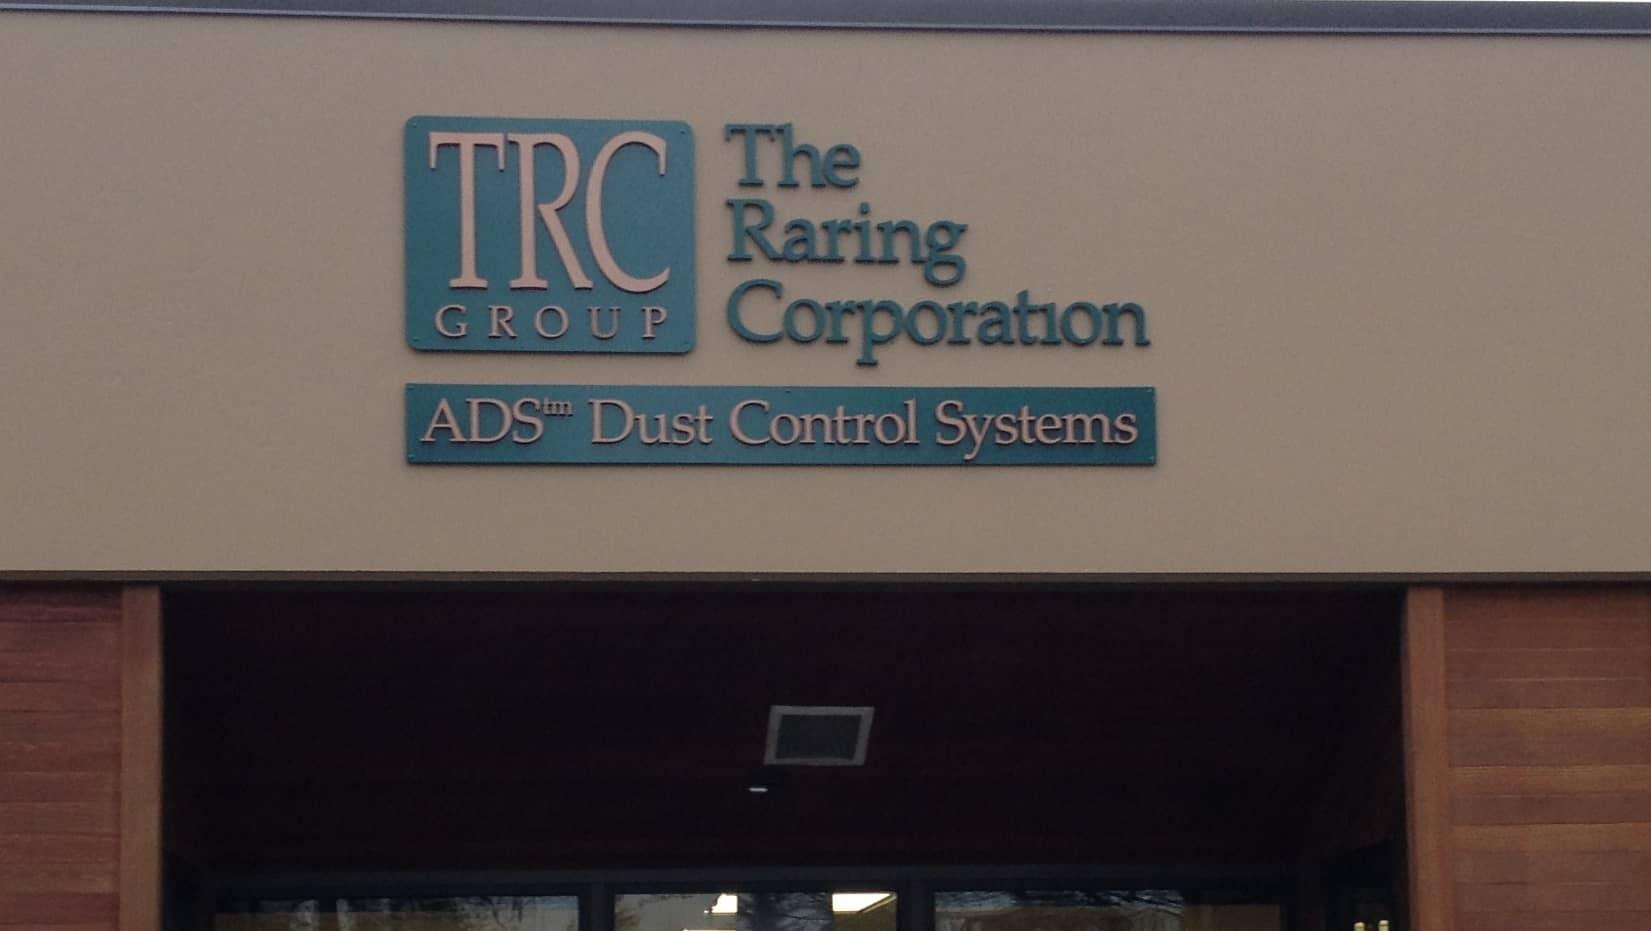 Raring Corp dimensional sign